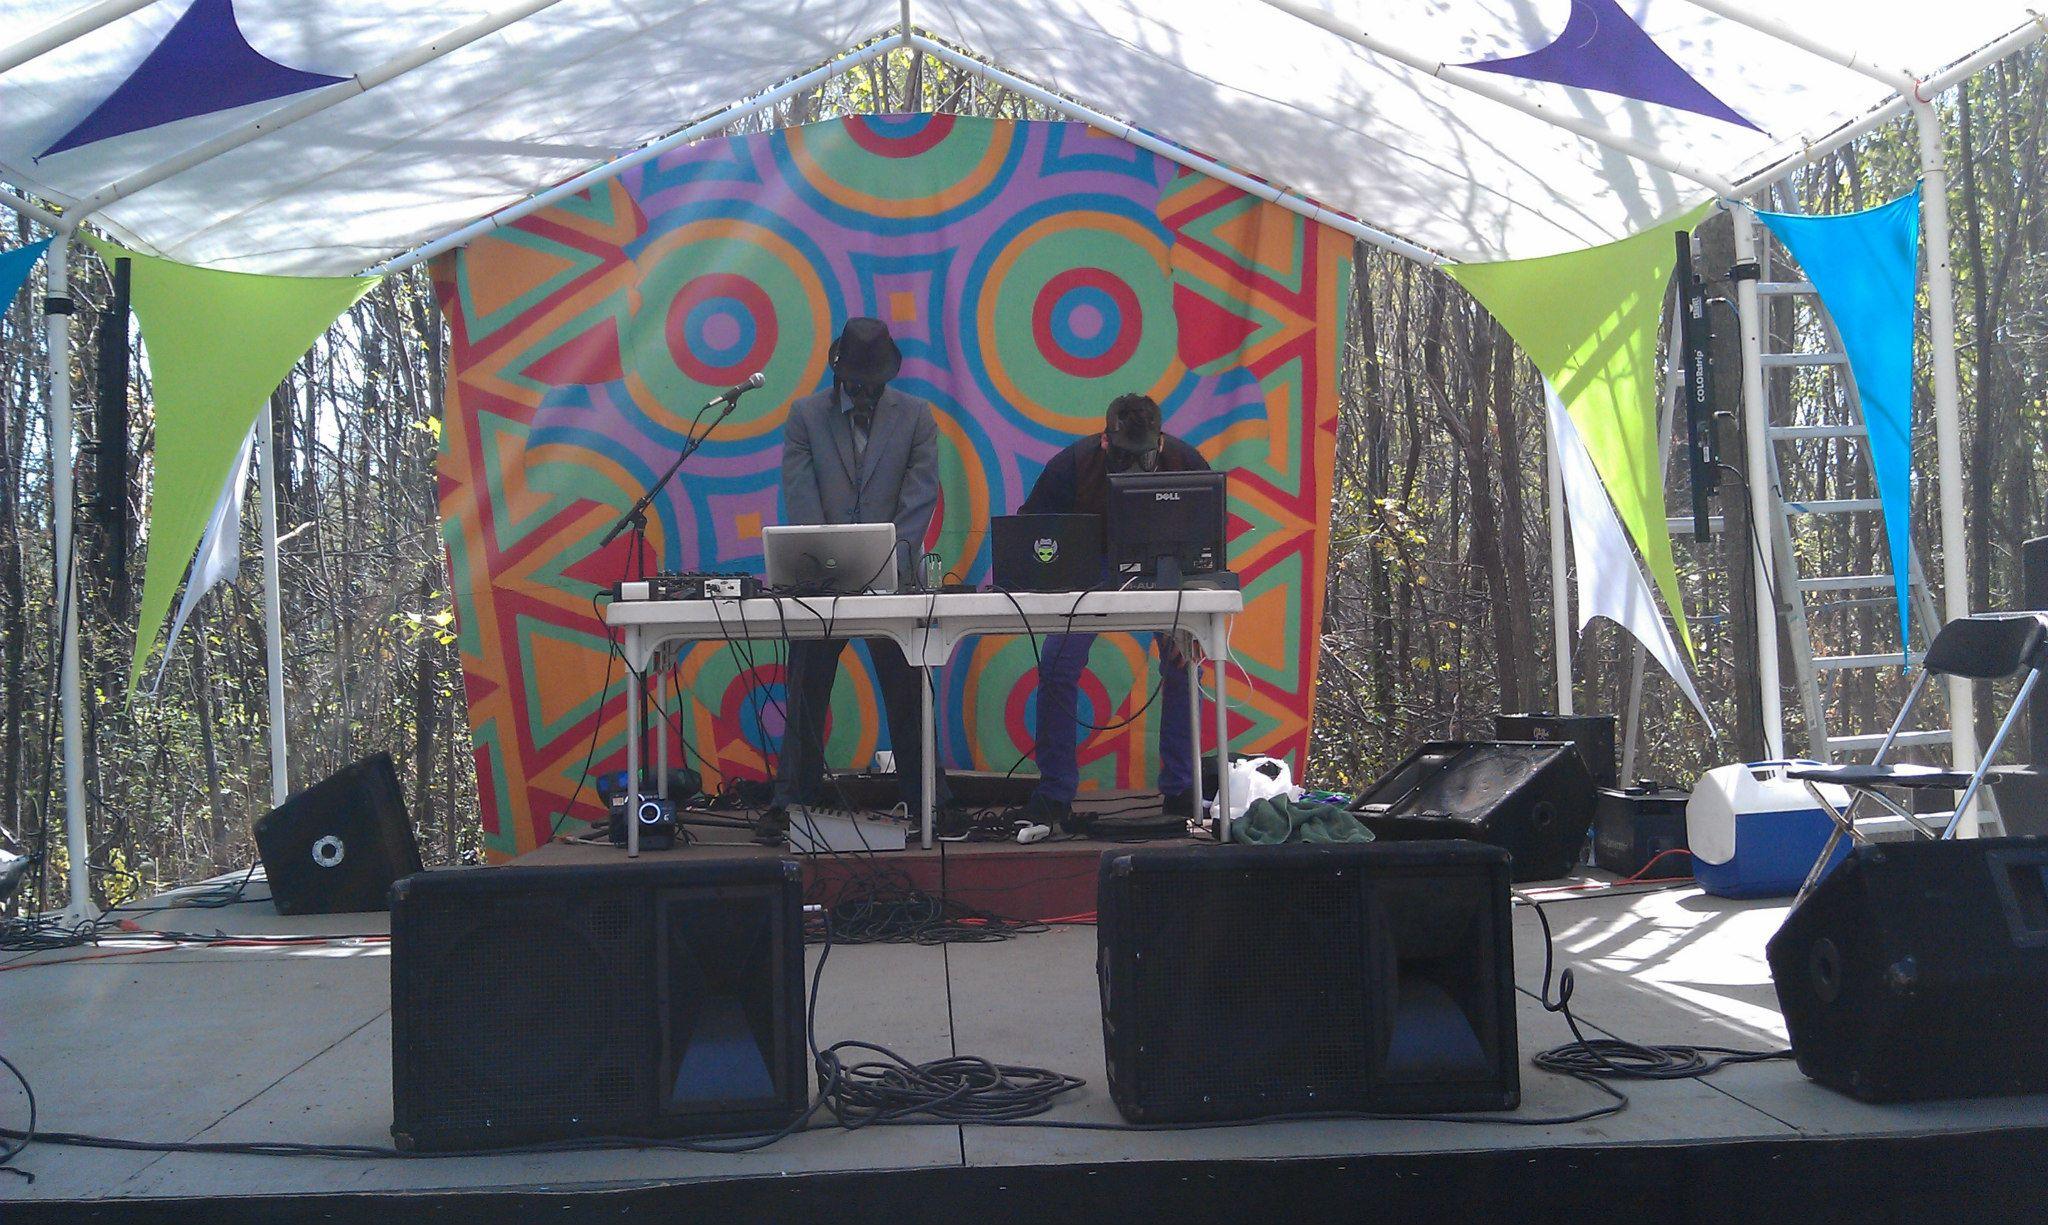 Bobbie Boob performing live at the 2nd Annual Tribal Equinox Festival in Nebraska